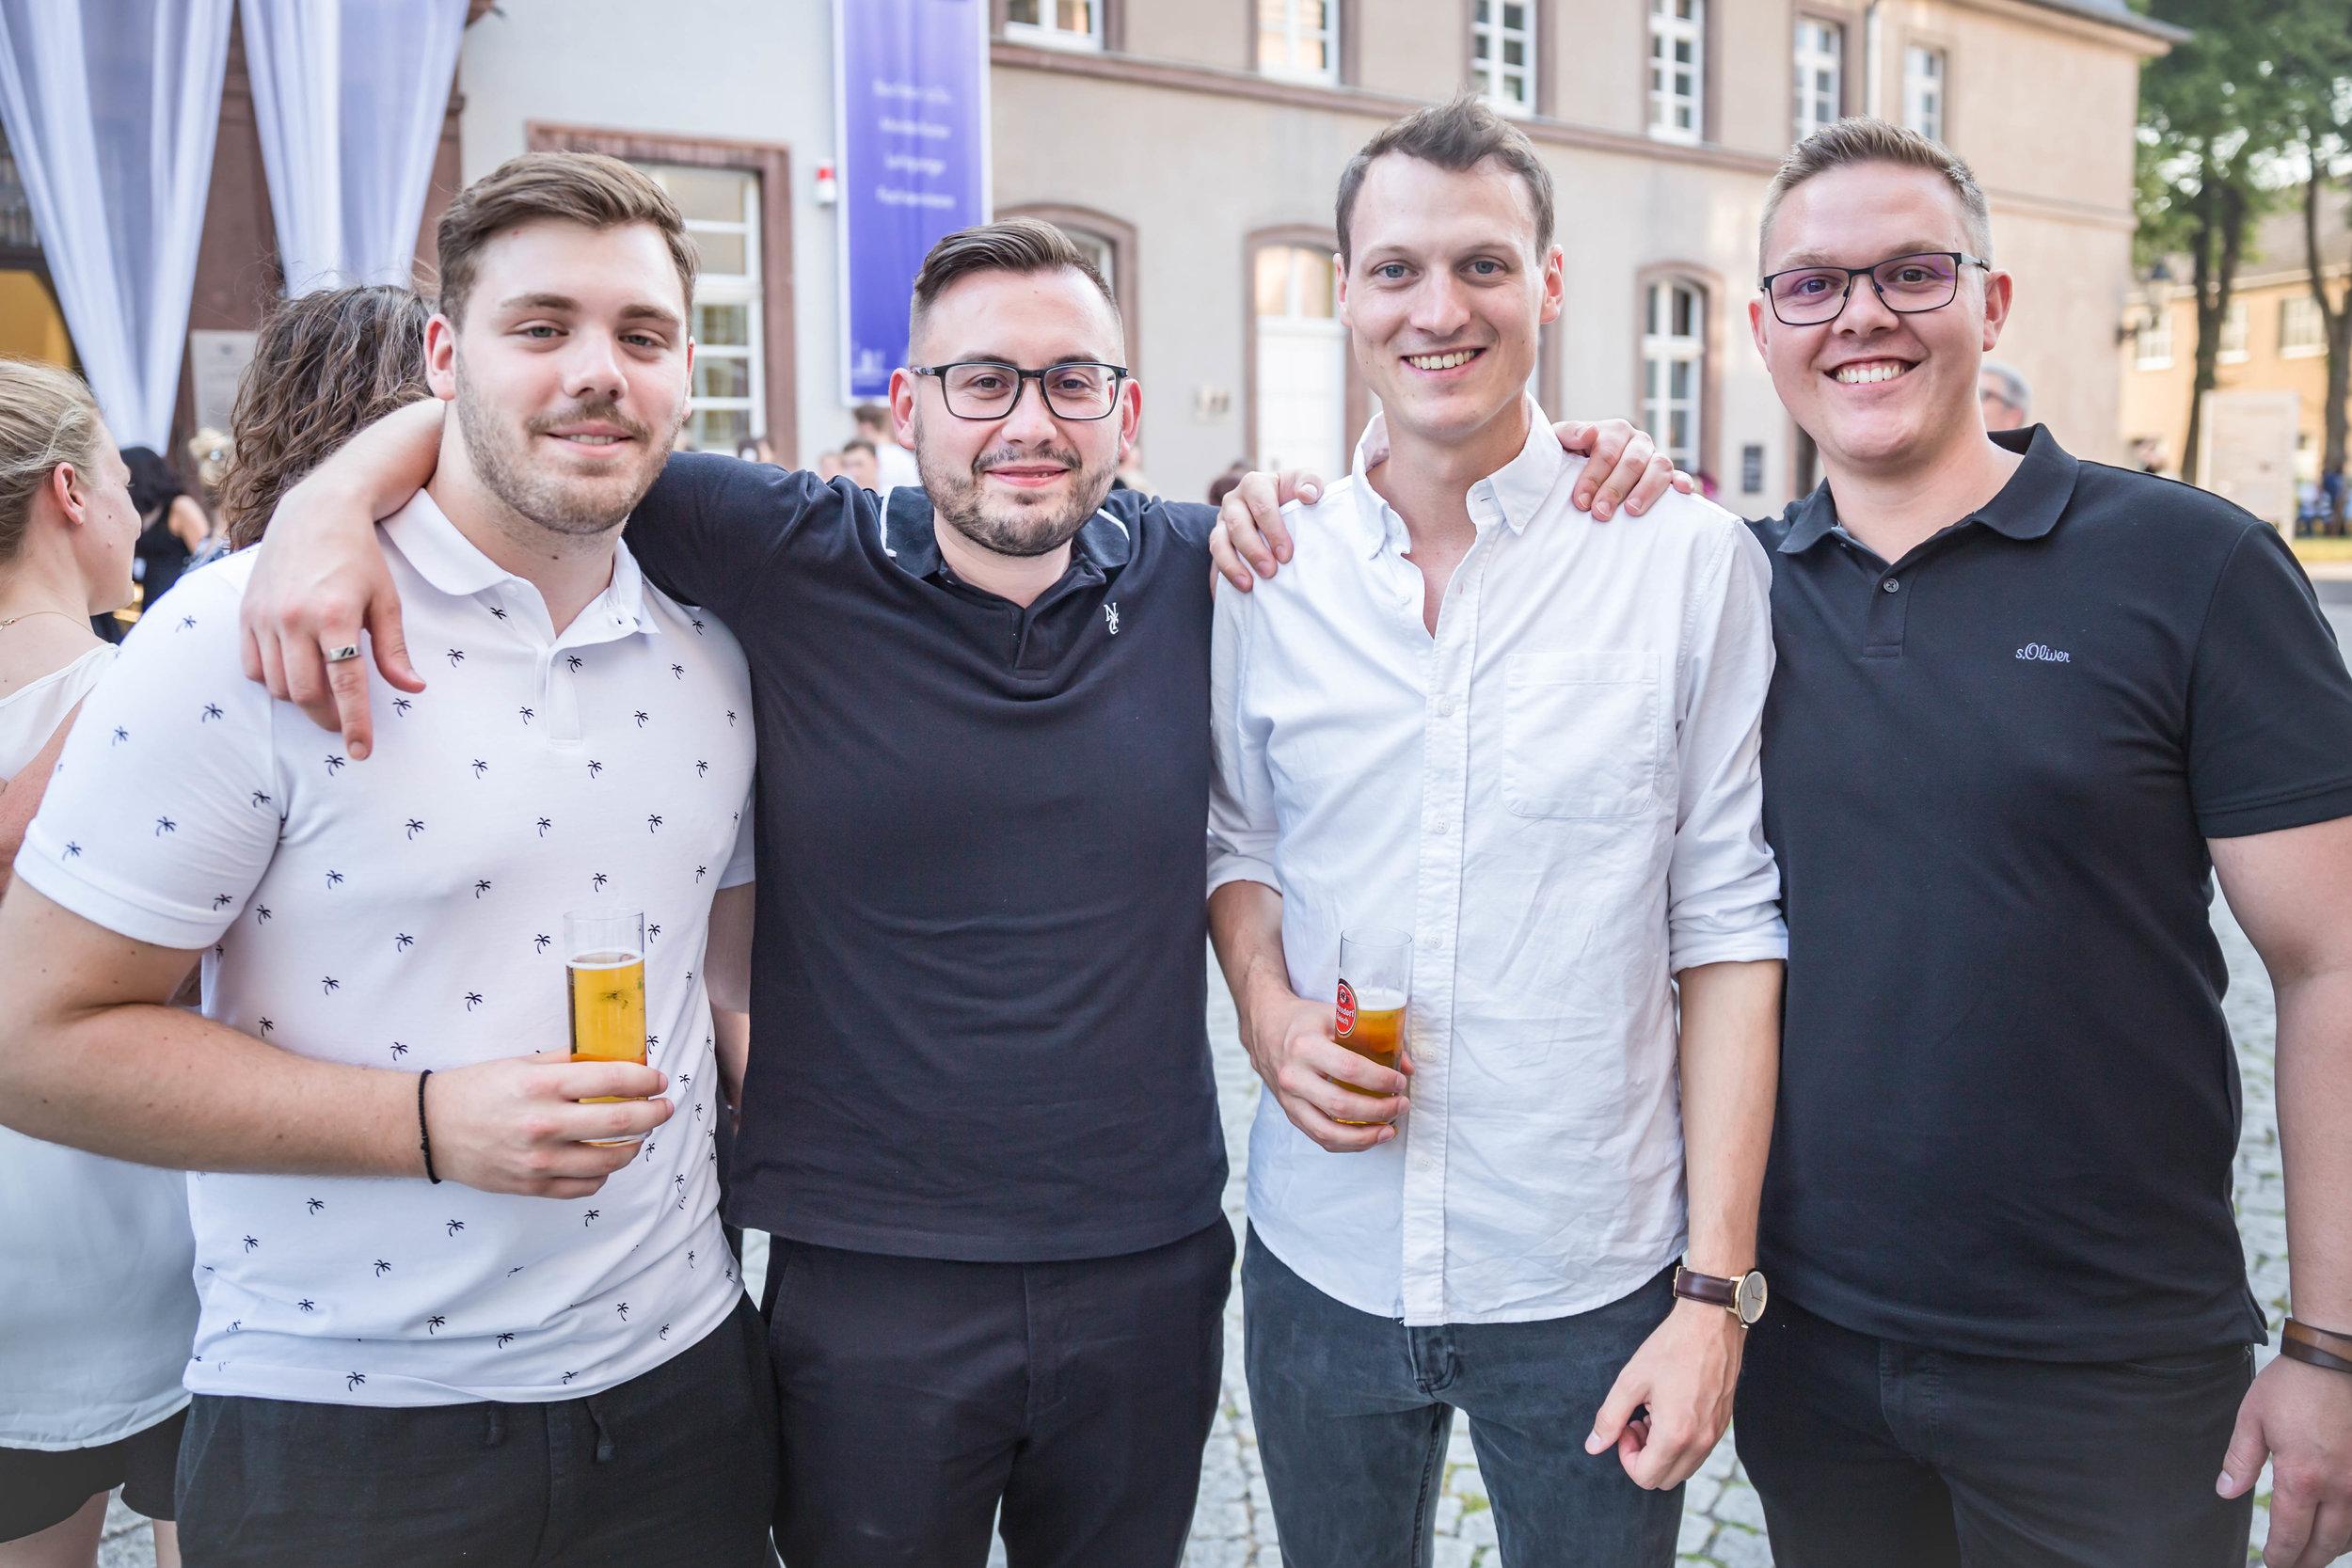 20190626_Akademie_40-jähriges_Jubiläum_FB_kl-5311858.jpg